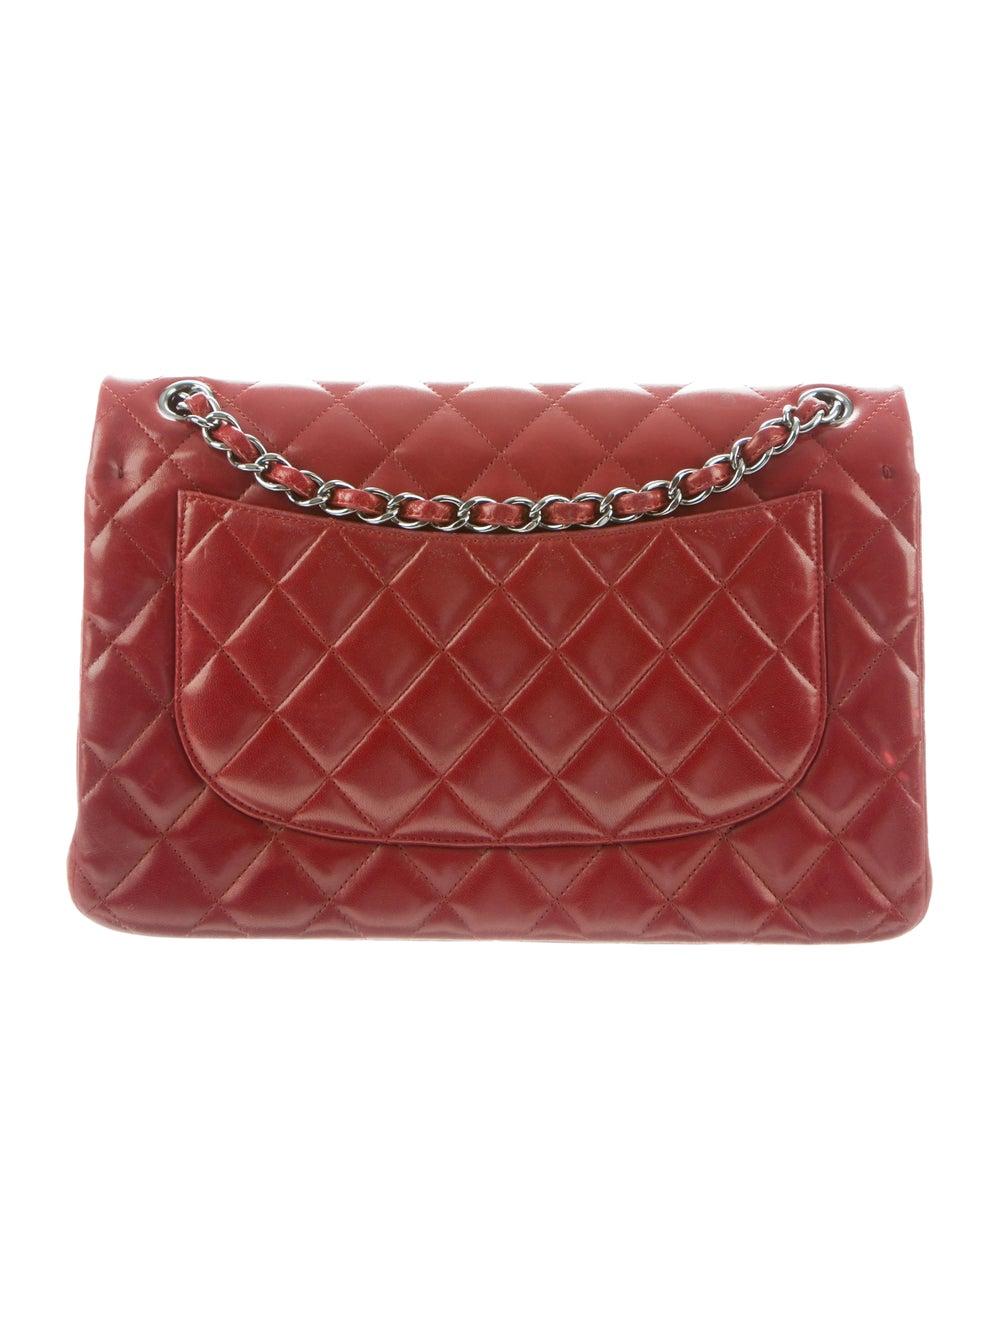 Chanel Jumbo Classic Double Flap Bag silver - image 4